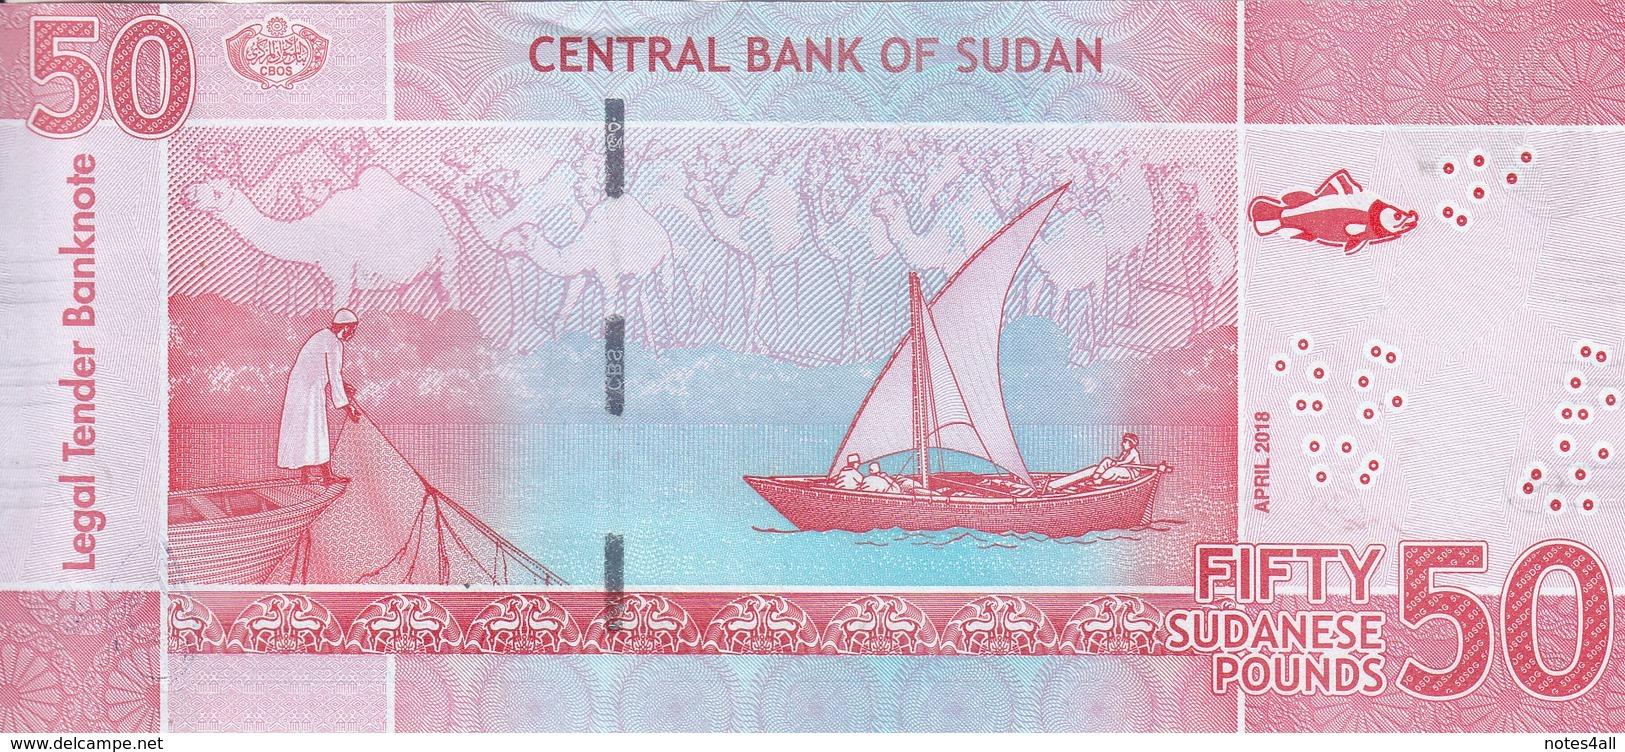 SUDAN 50 POUNDS 2018 P-NEW REPLACEMENT UNC */* - Sudan